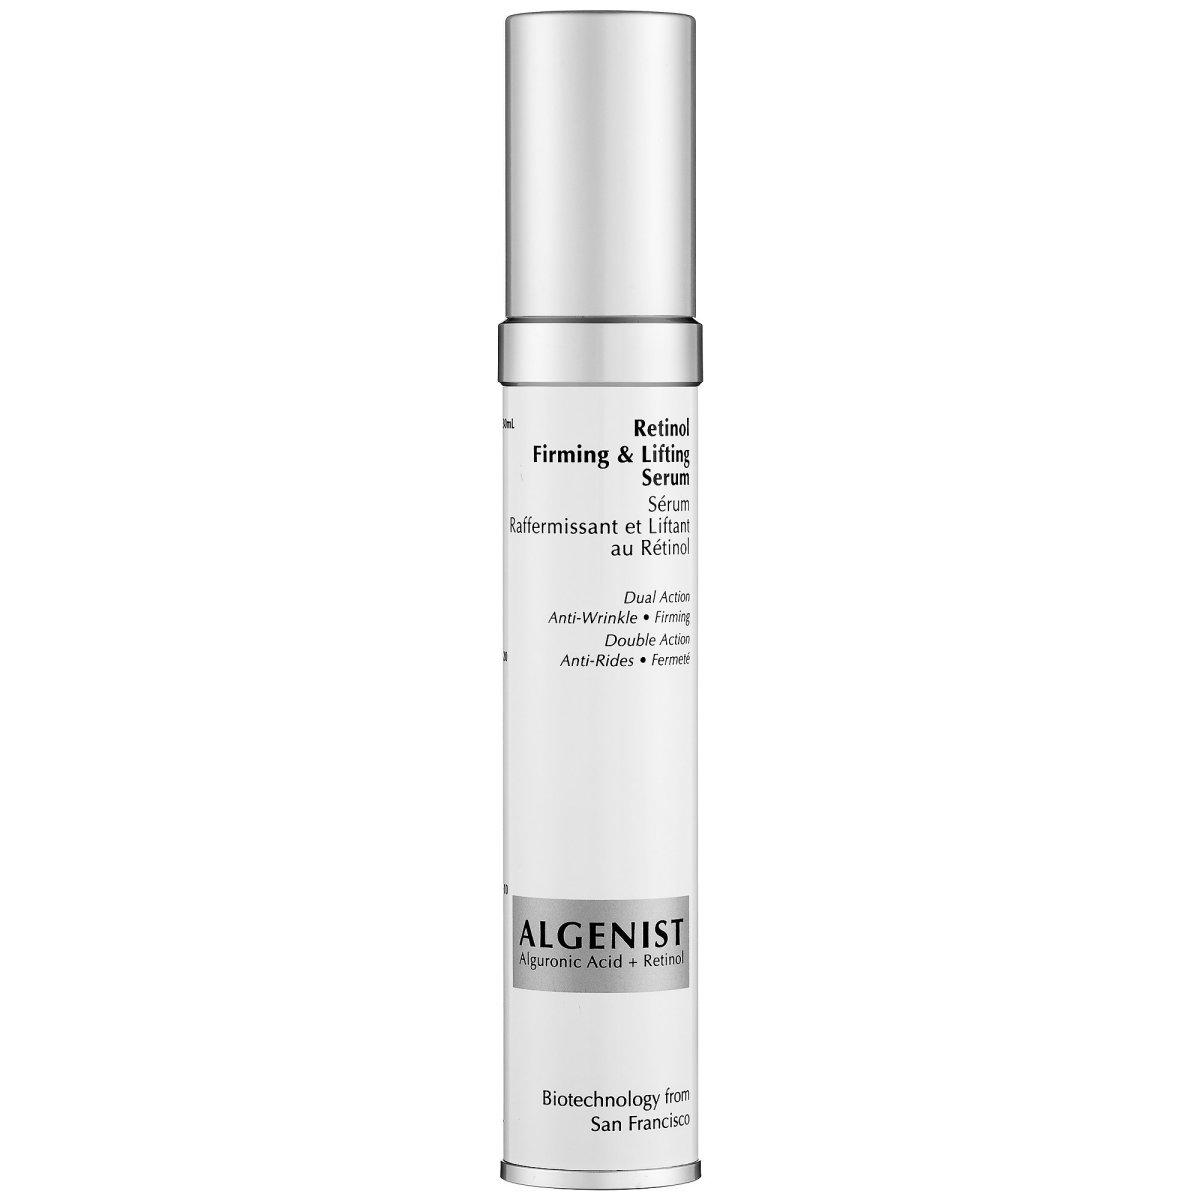 Algenist Retinol Firming and Lifting Serum